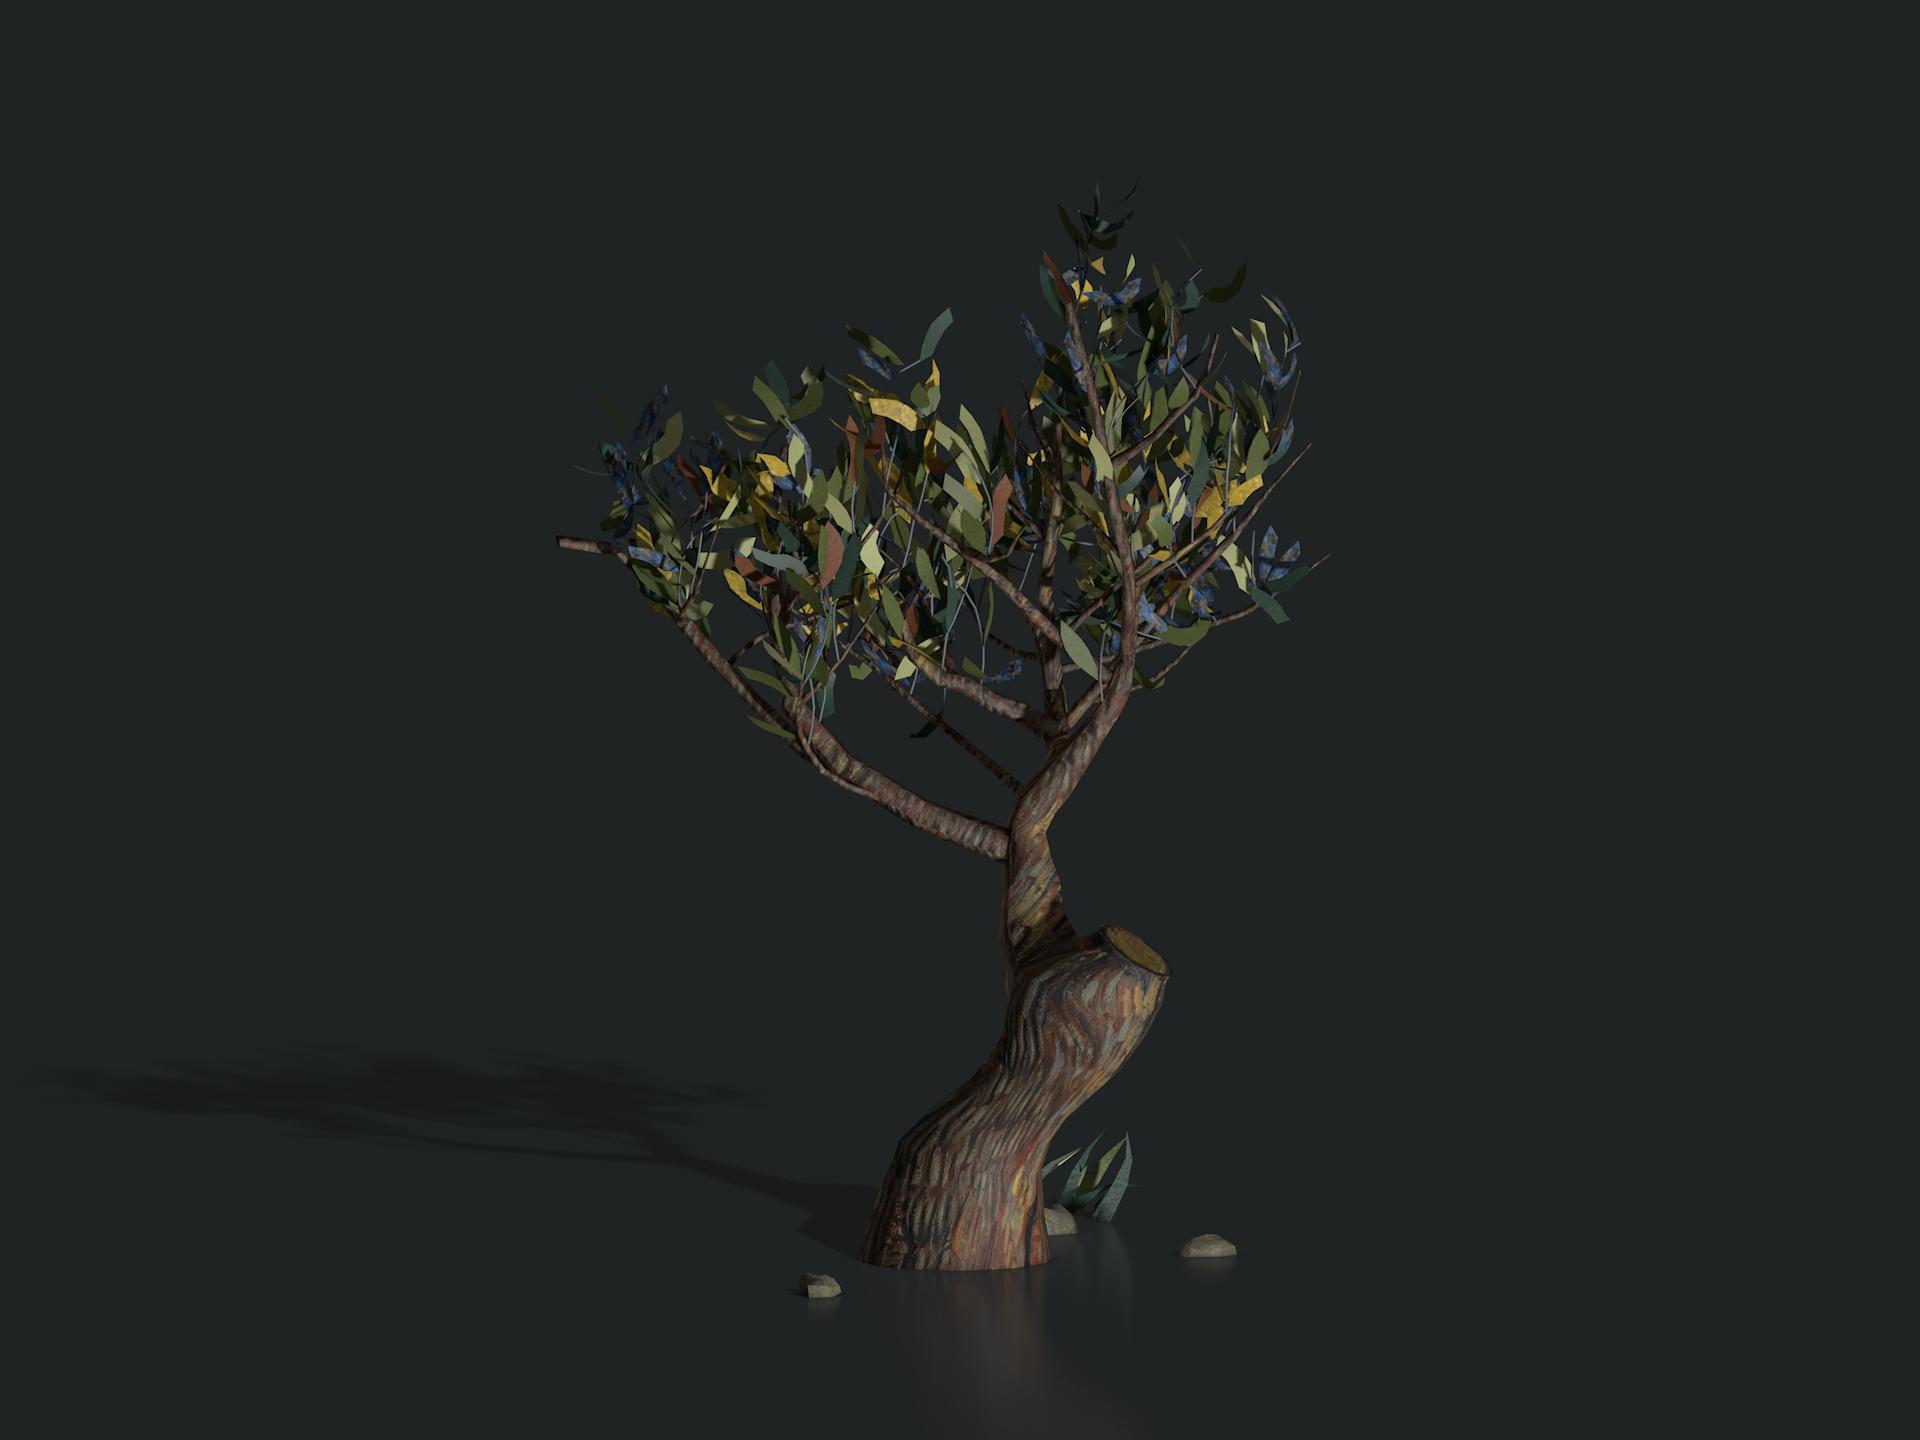 plants_saint_remy_tree1307.png